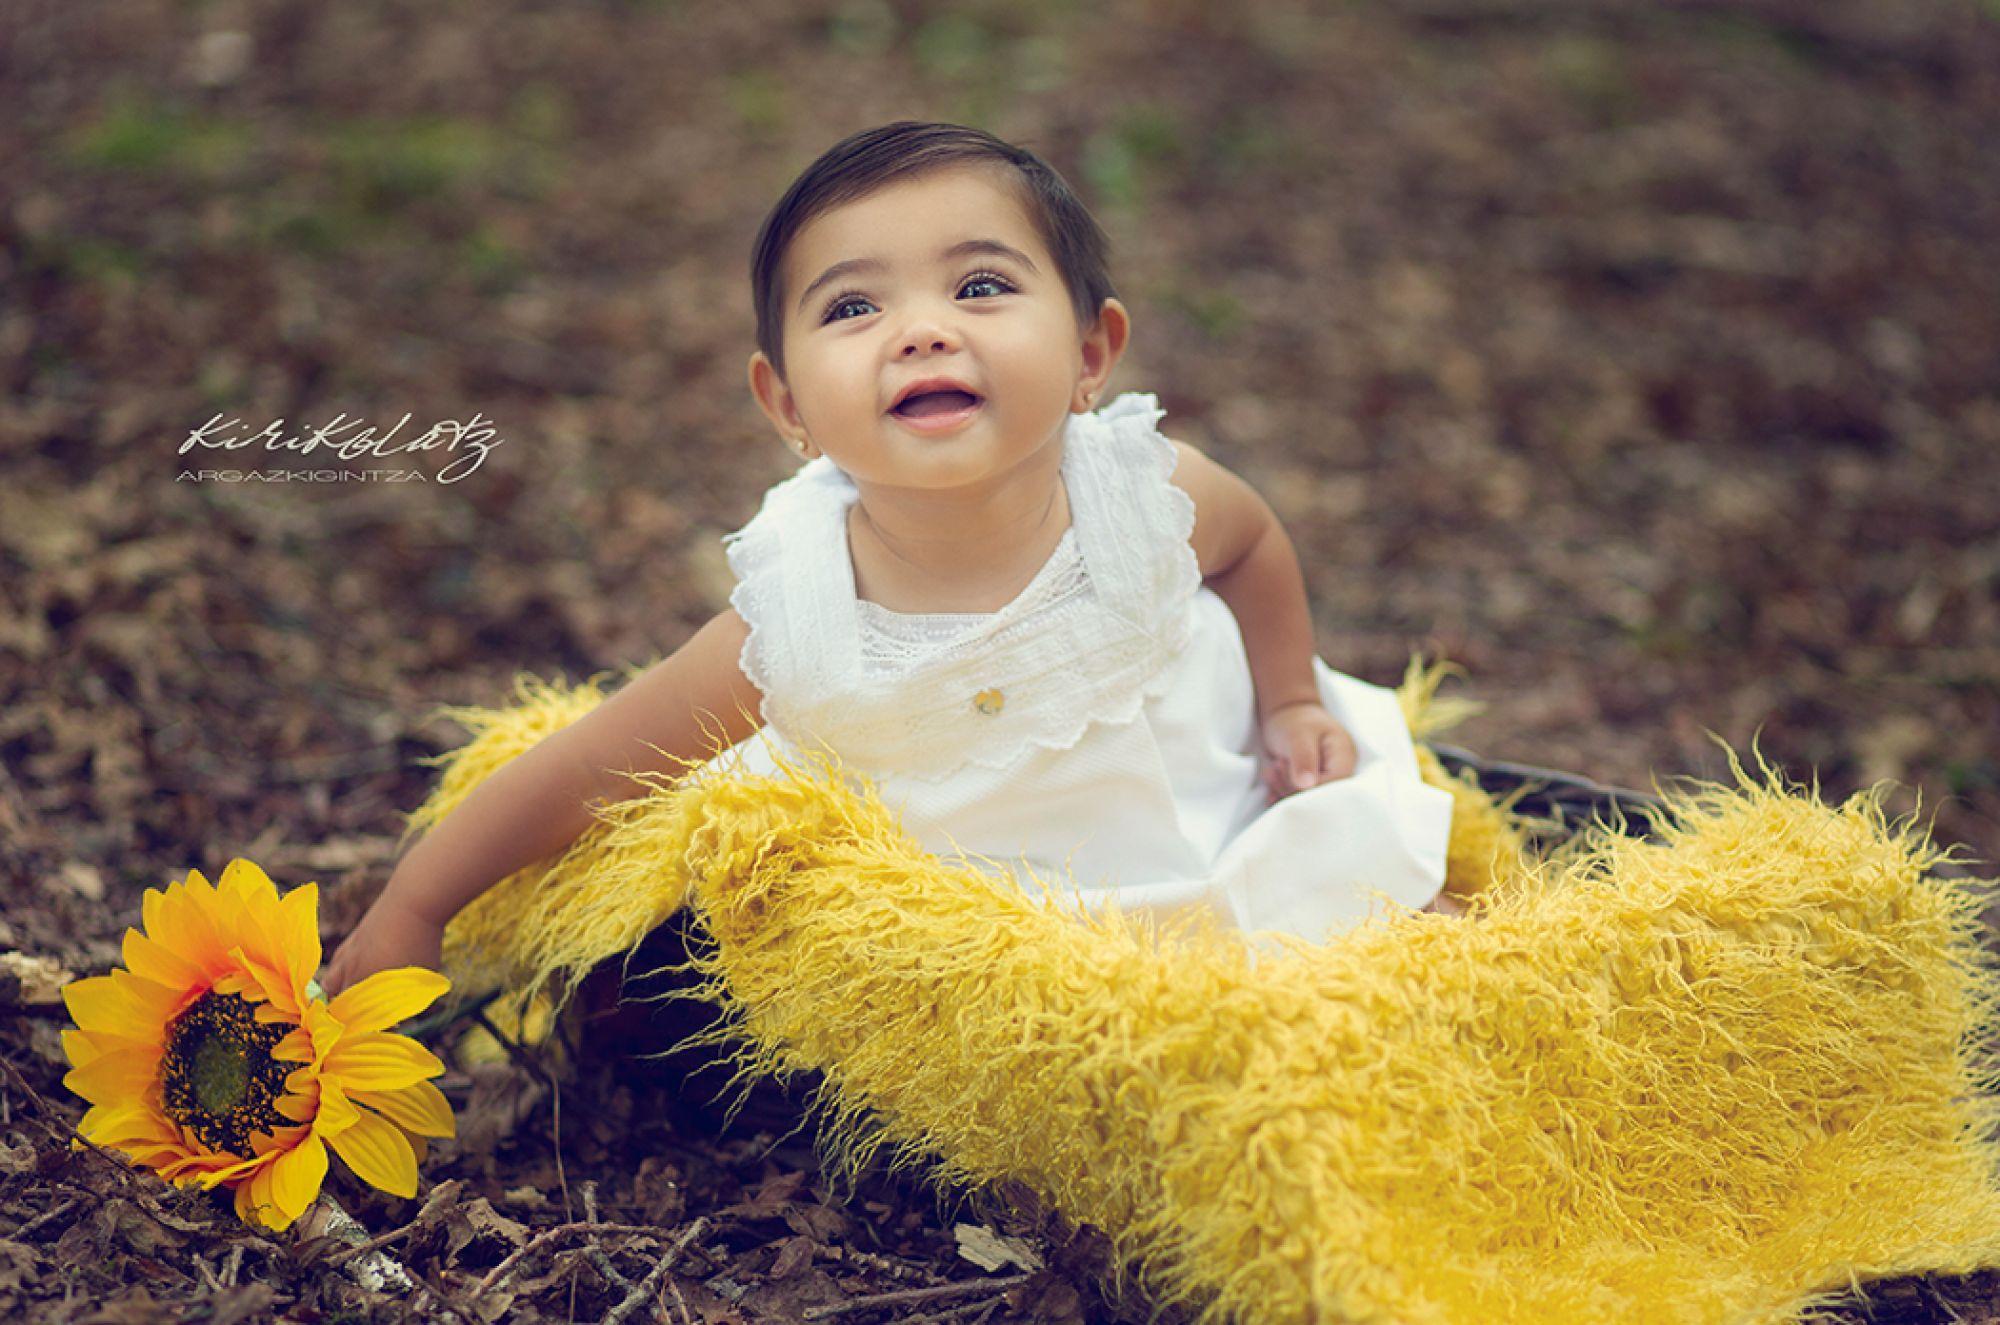 Fotos de bebé en exteriores, Malen